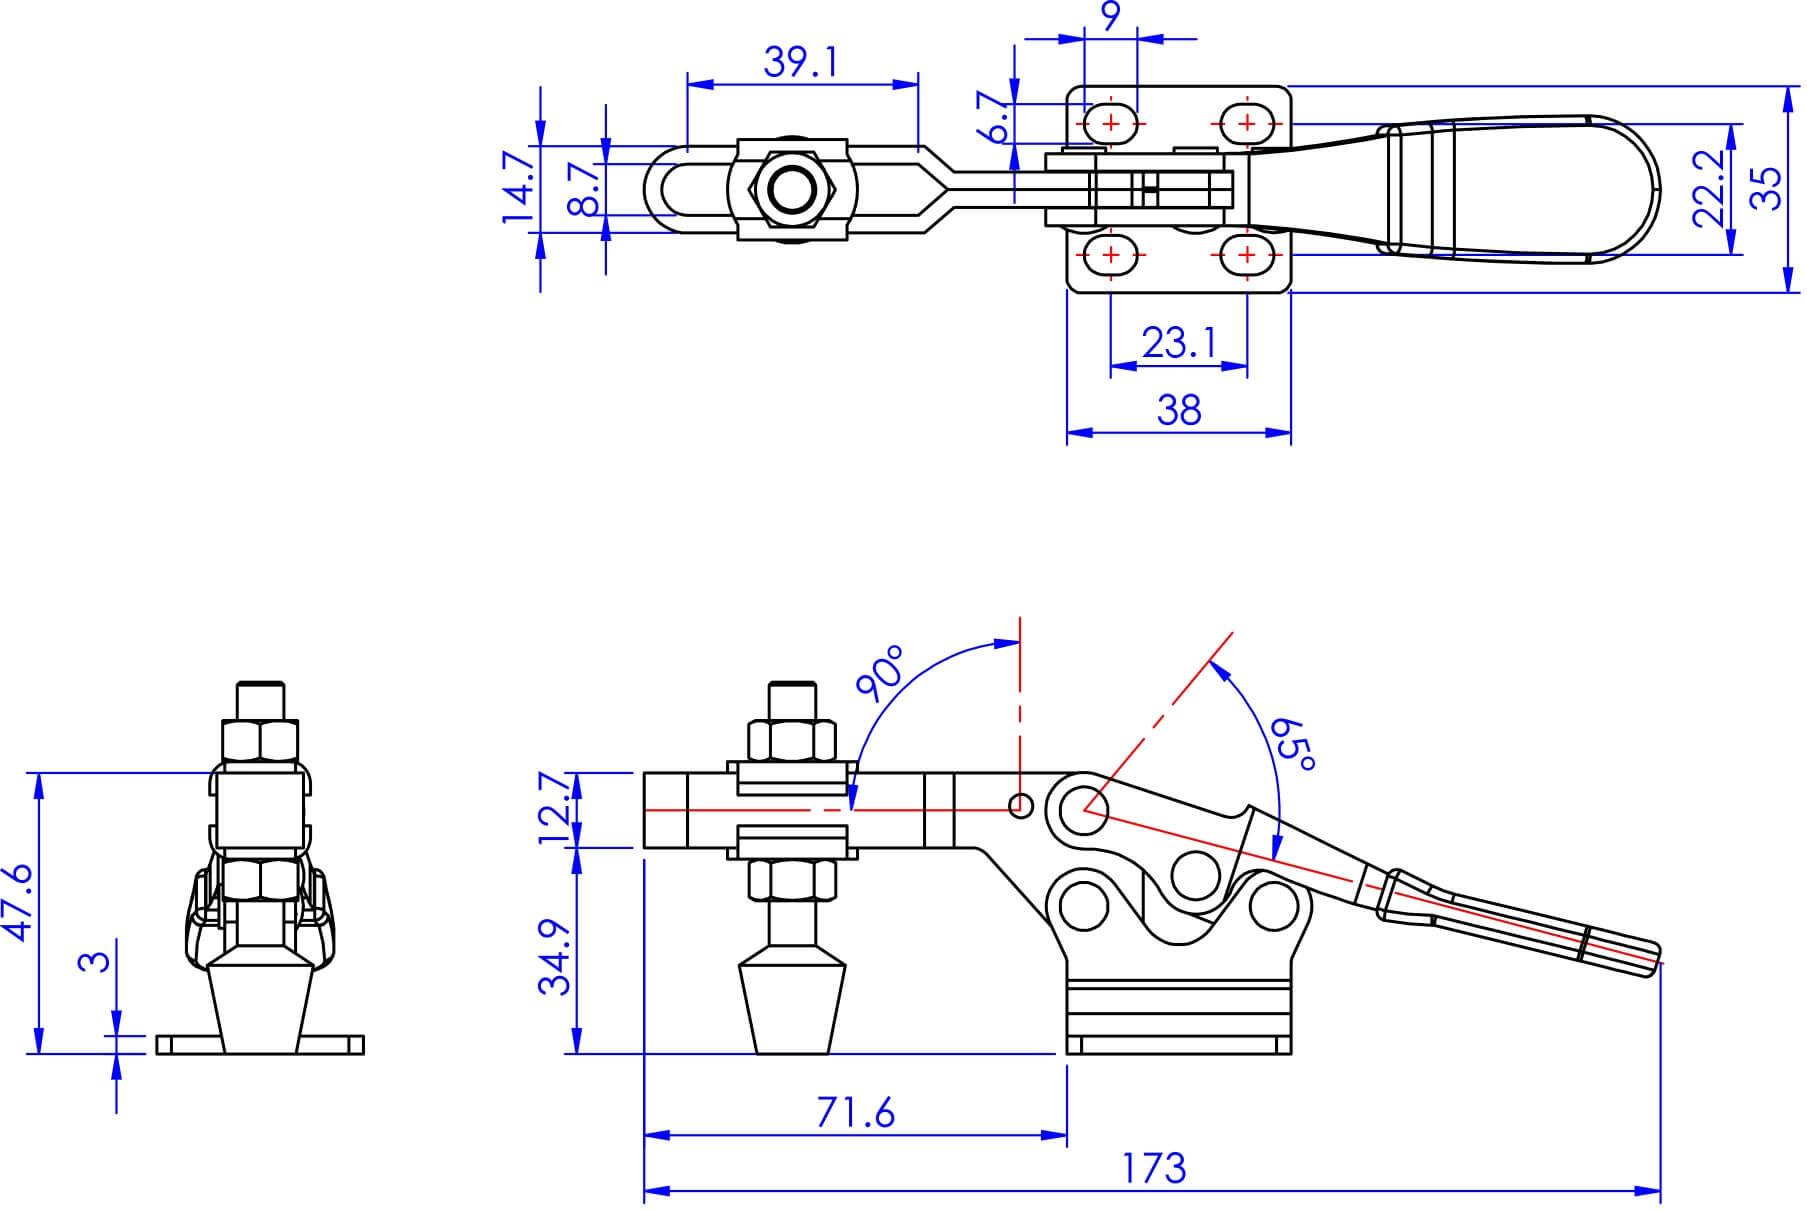 toggle-clamp-gh-225-d-6-1-.jpg